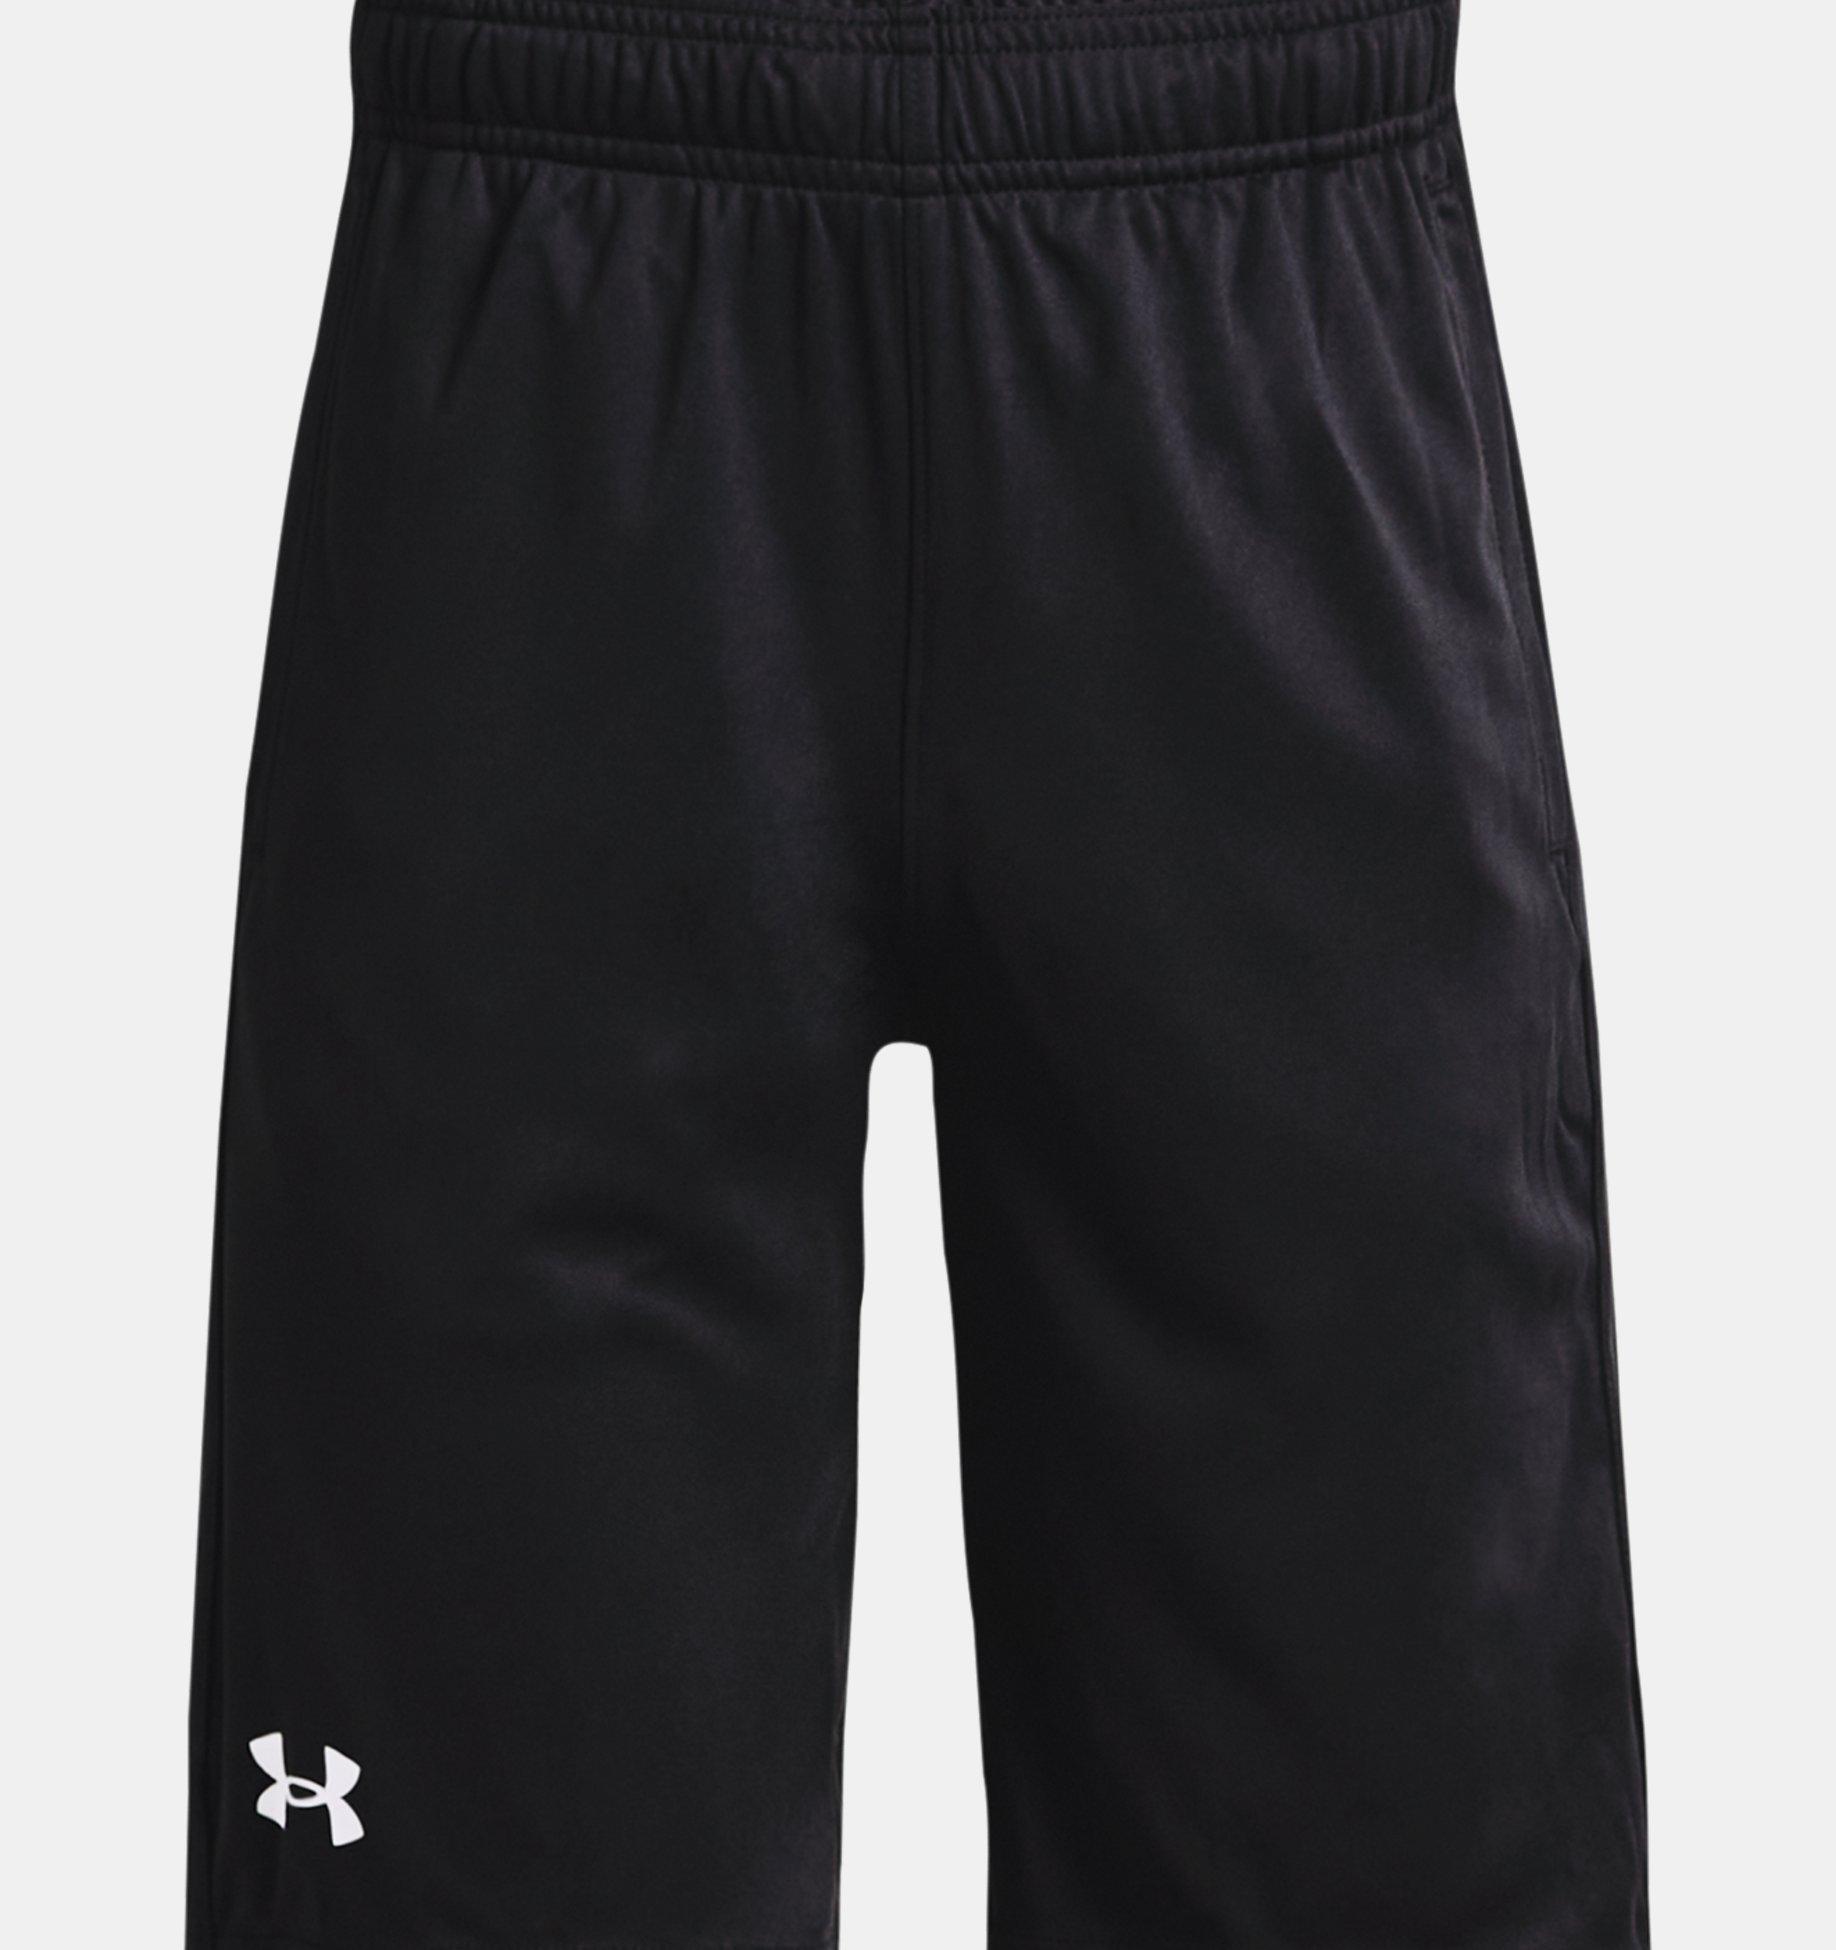 Under Armour Boys' UA Velocity Shorts $11, UA Match Play Golf Shorts $19 [Military/First Responders/Educators: Velocity $6.59, Golf $11.40] + FS